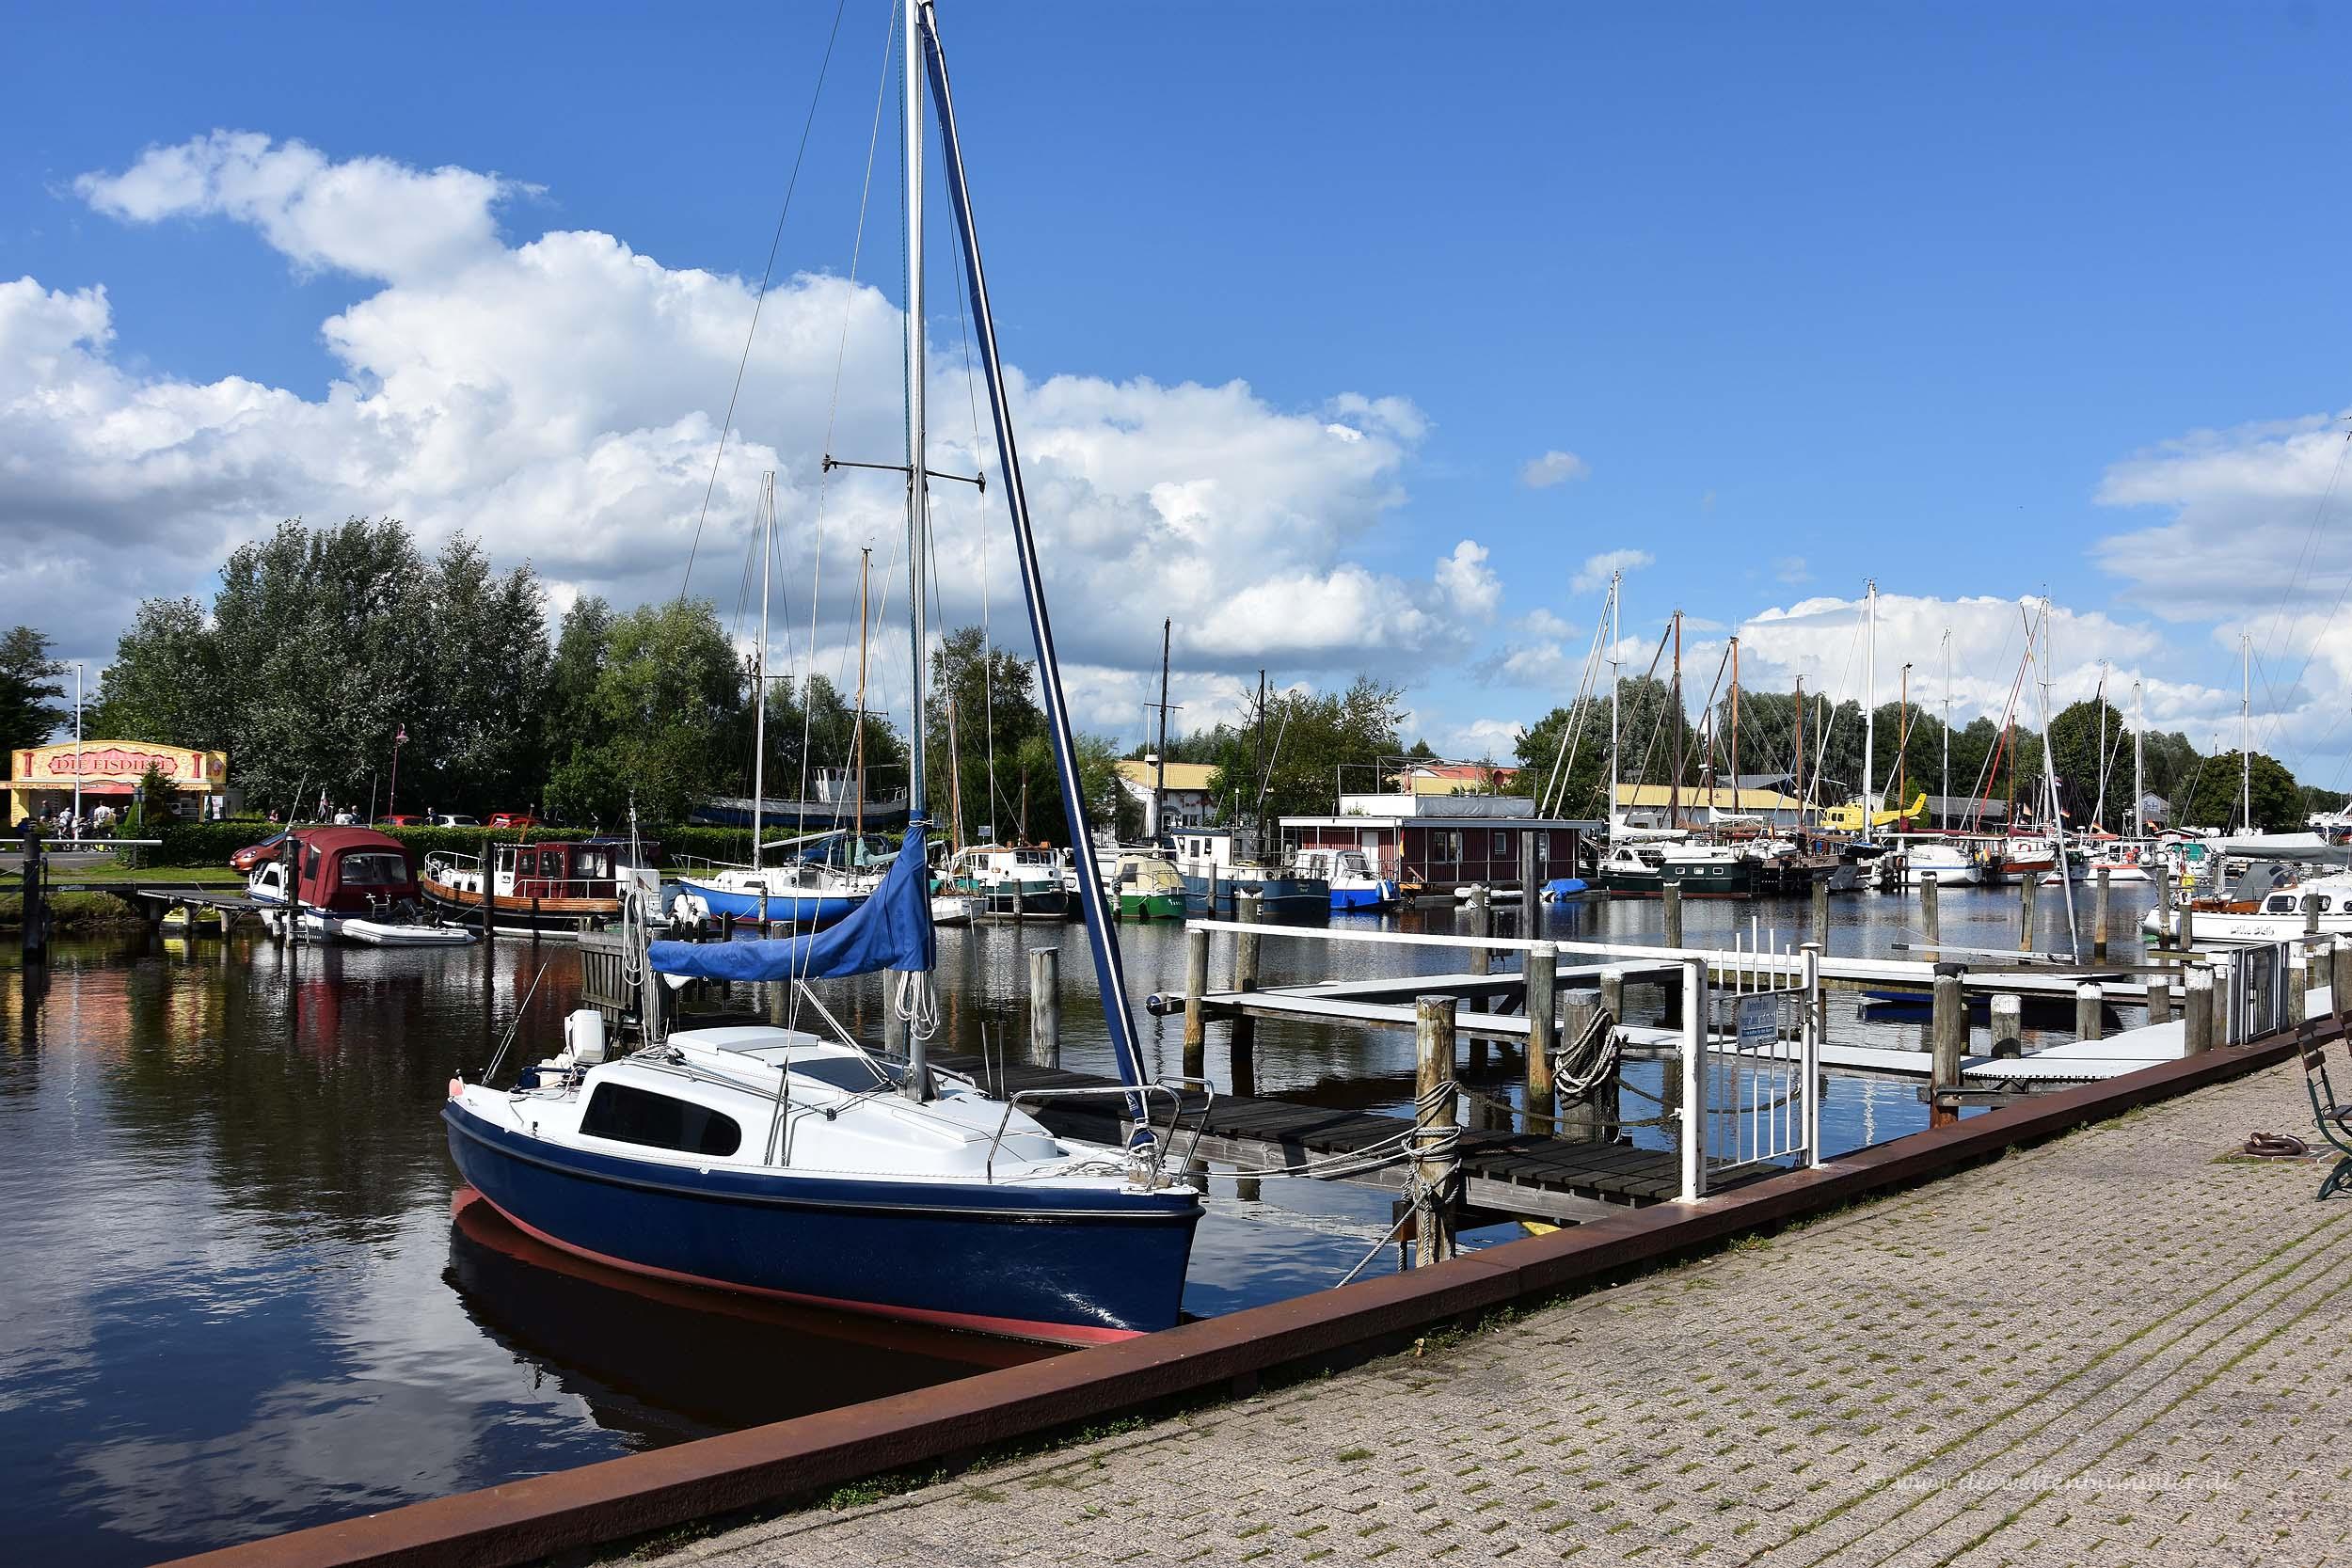 Kleiner Hafen in Varel